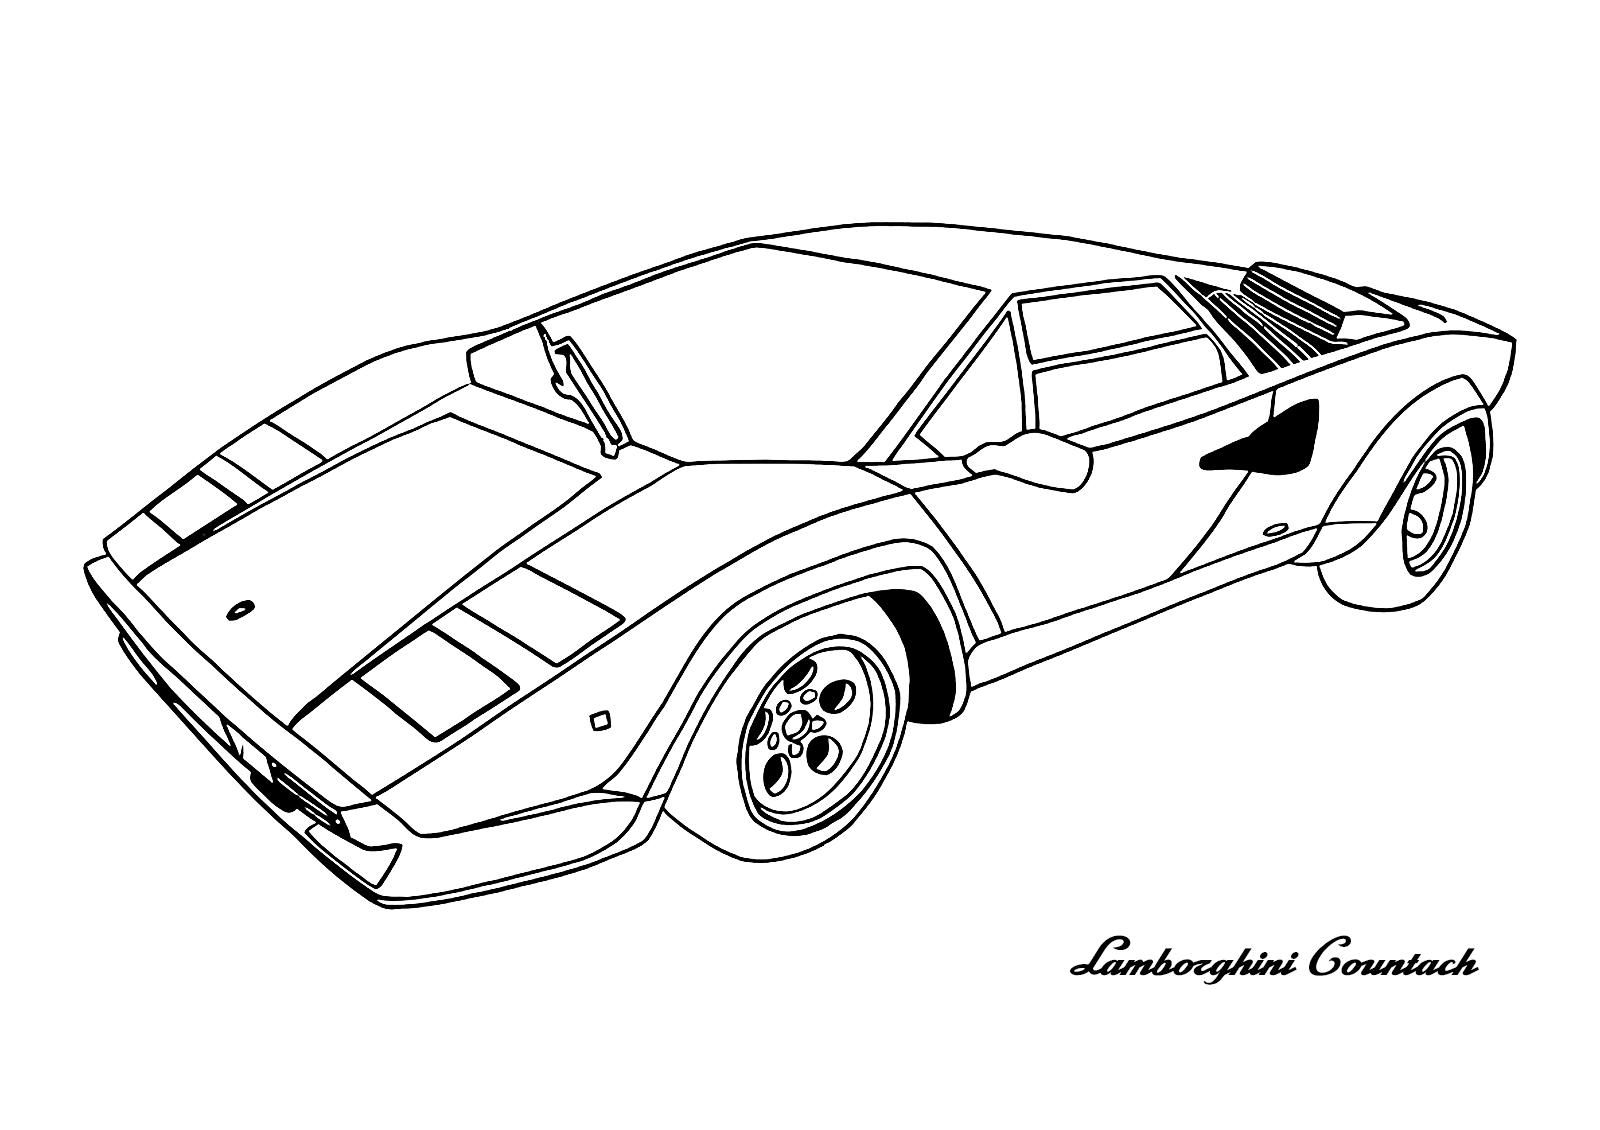 Cars Lamborghini Countach | Cars Coloring Pages | Pinterest